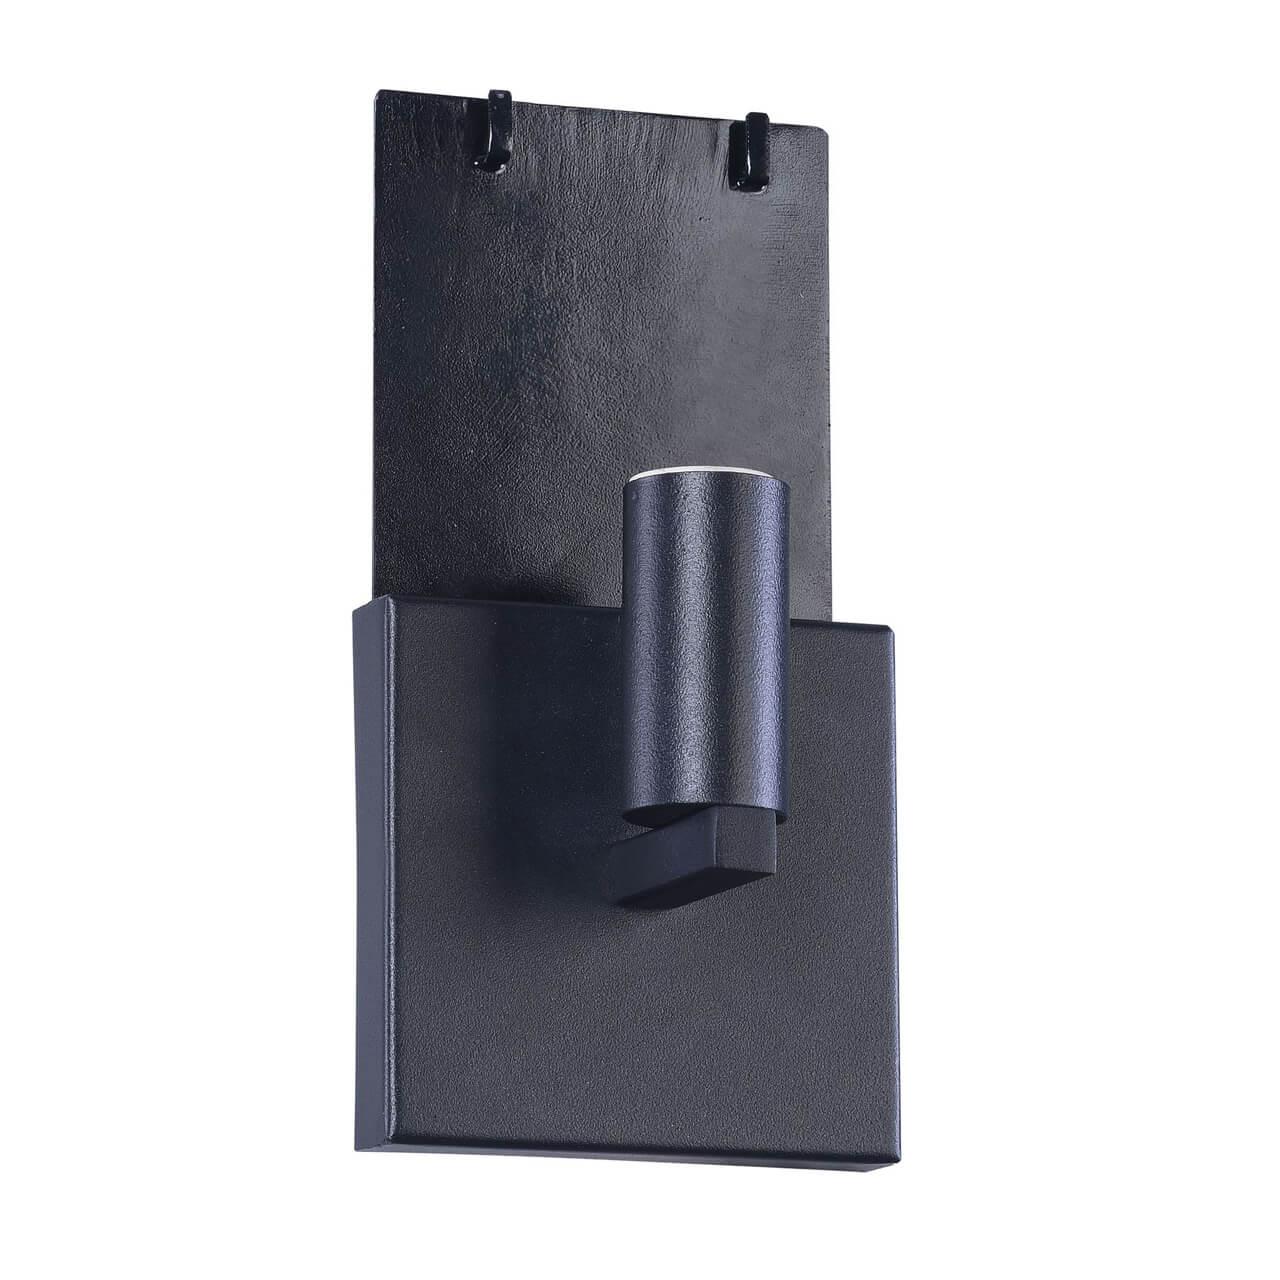 Основание для бра Maytoni Toronto MOD974-WLBase-01-Black